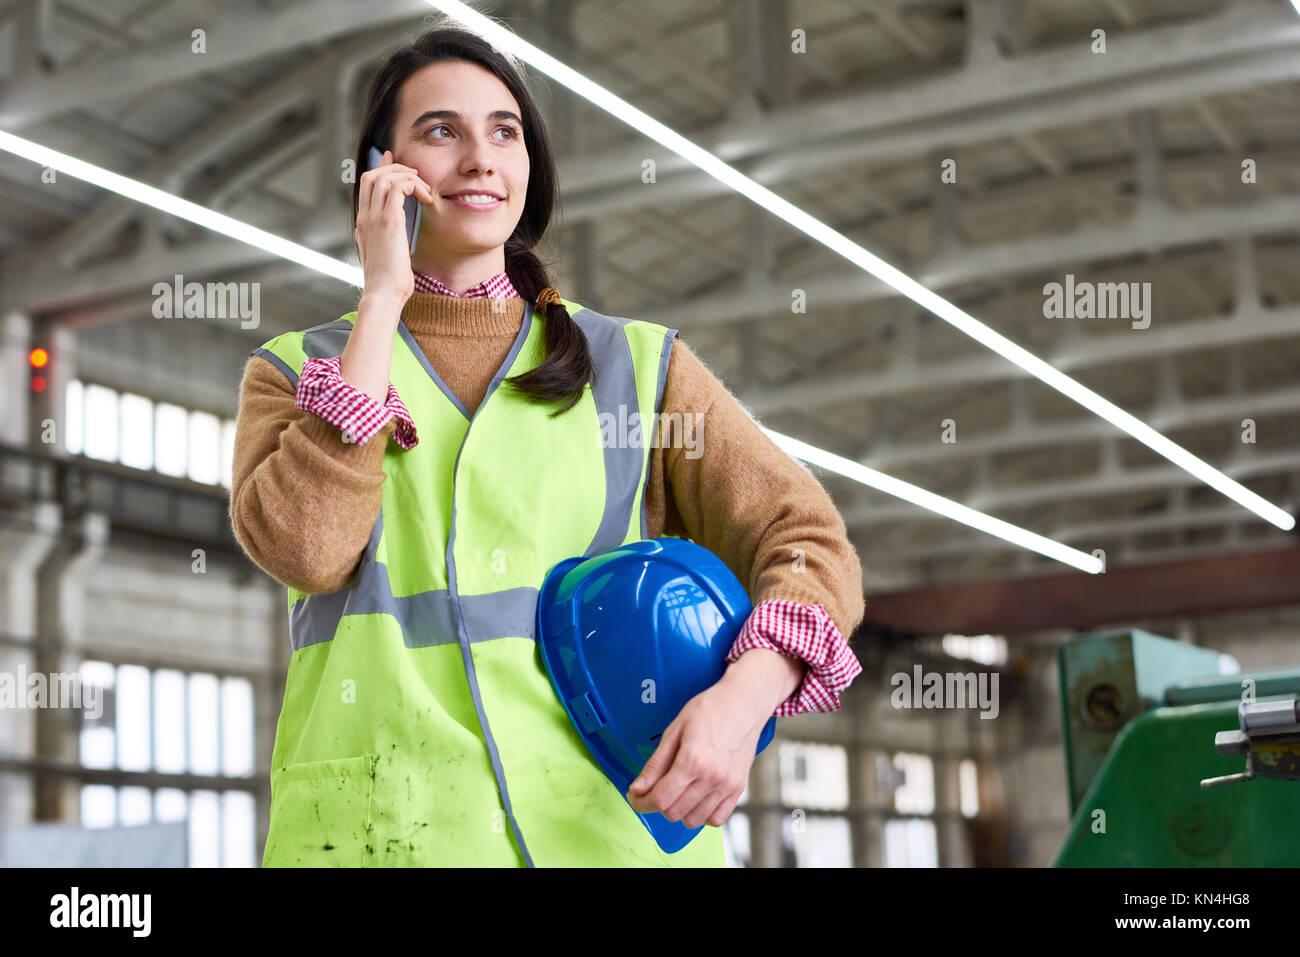 Waist-up Portrait of Smiling Technician - Stock Image